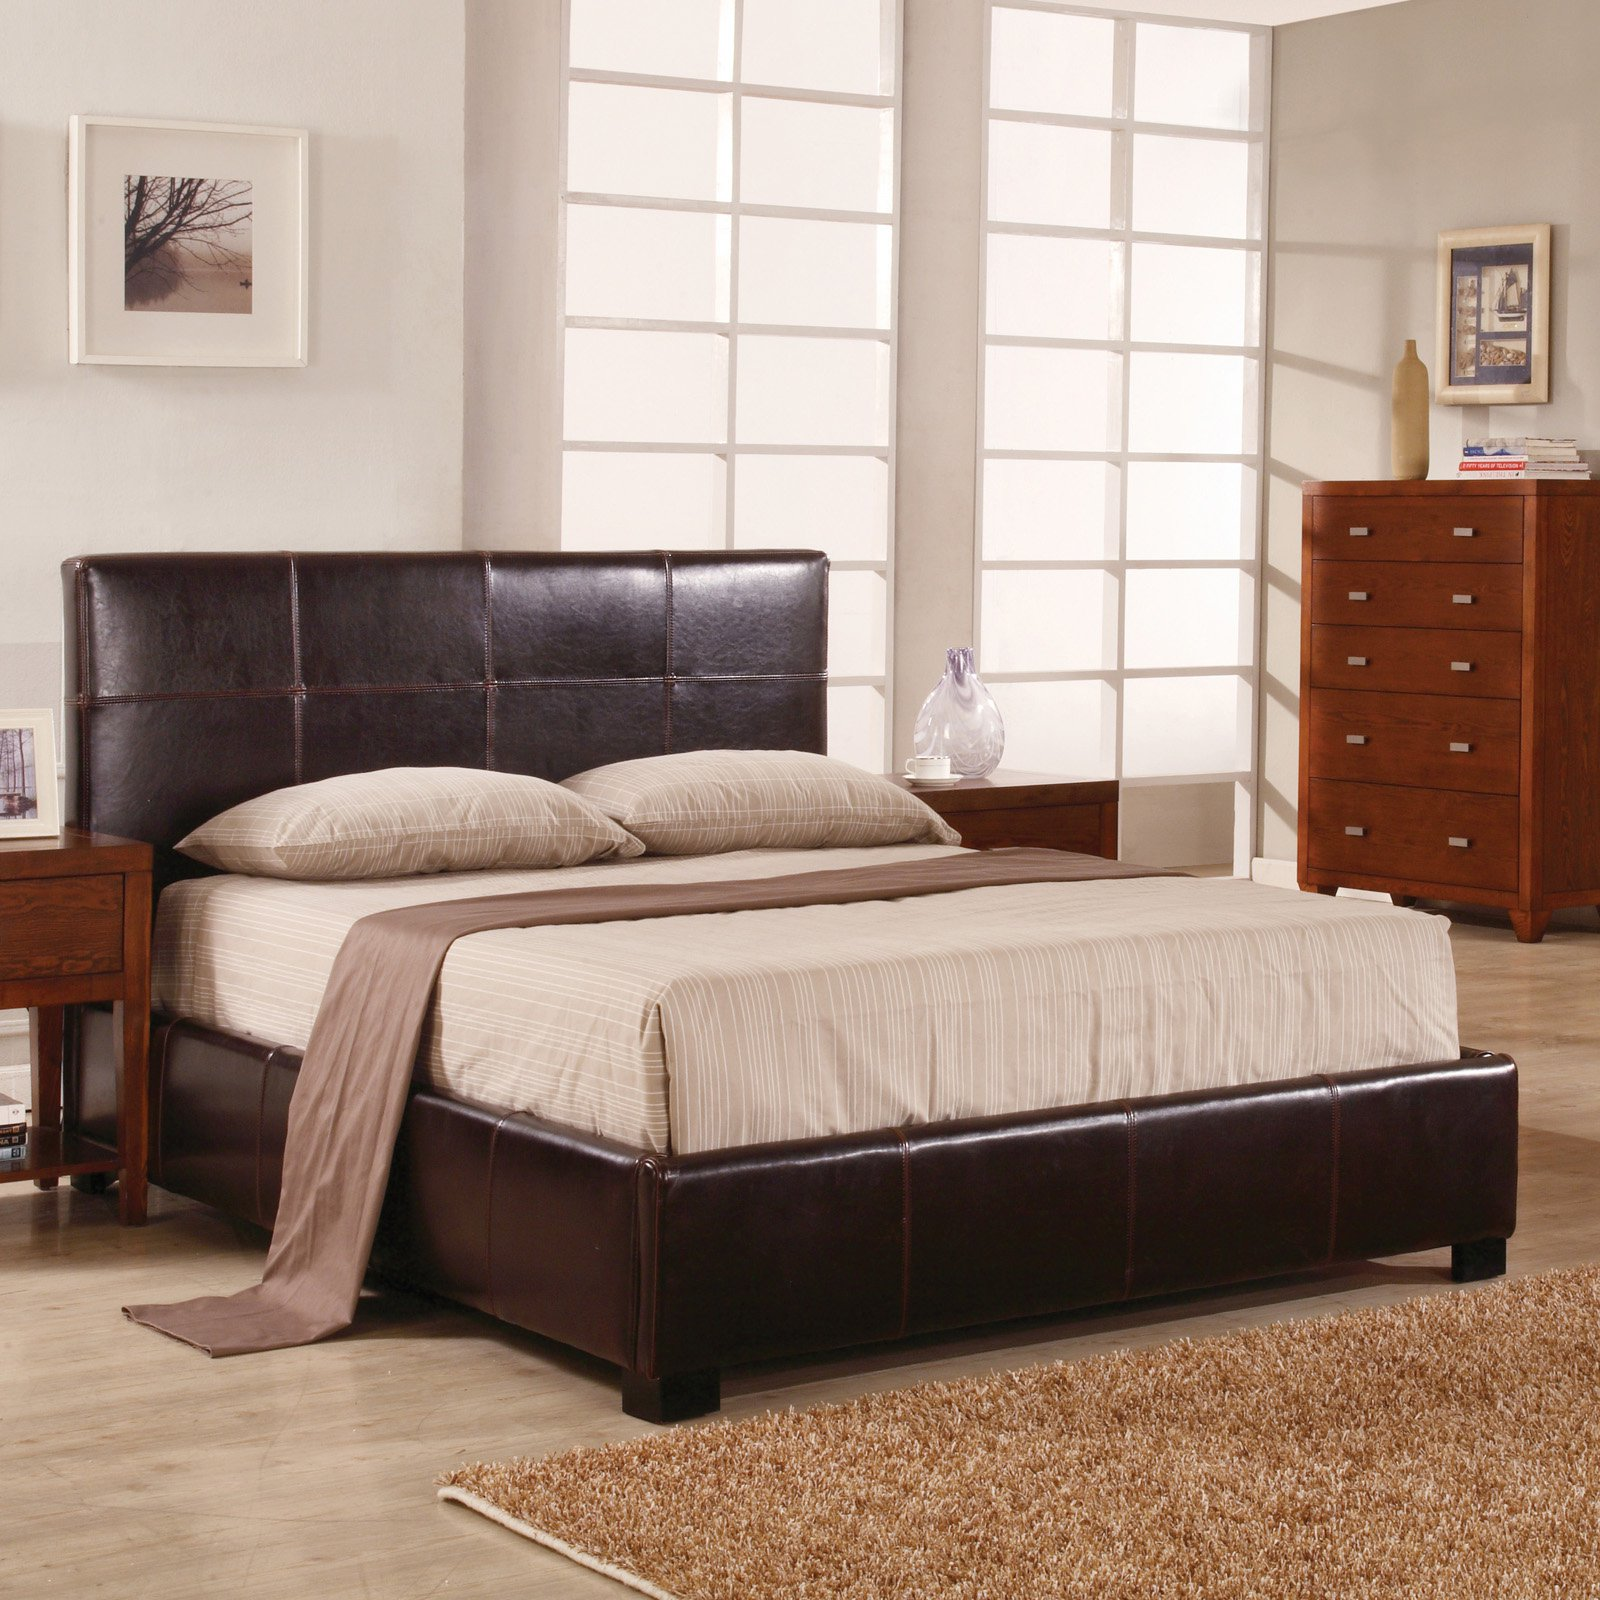 Upholstered Lucca Storage Platform Bed - Full/Double